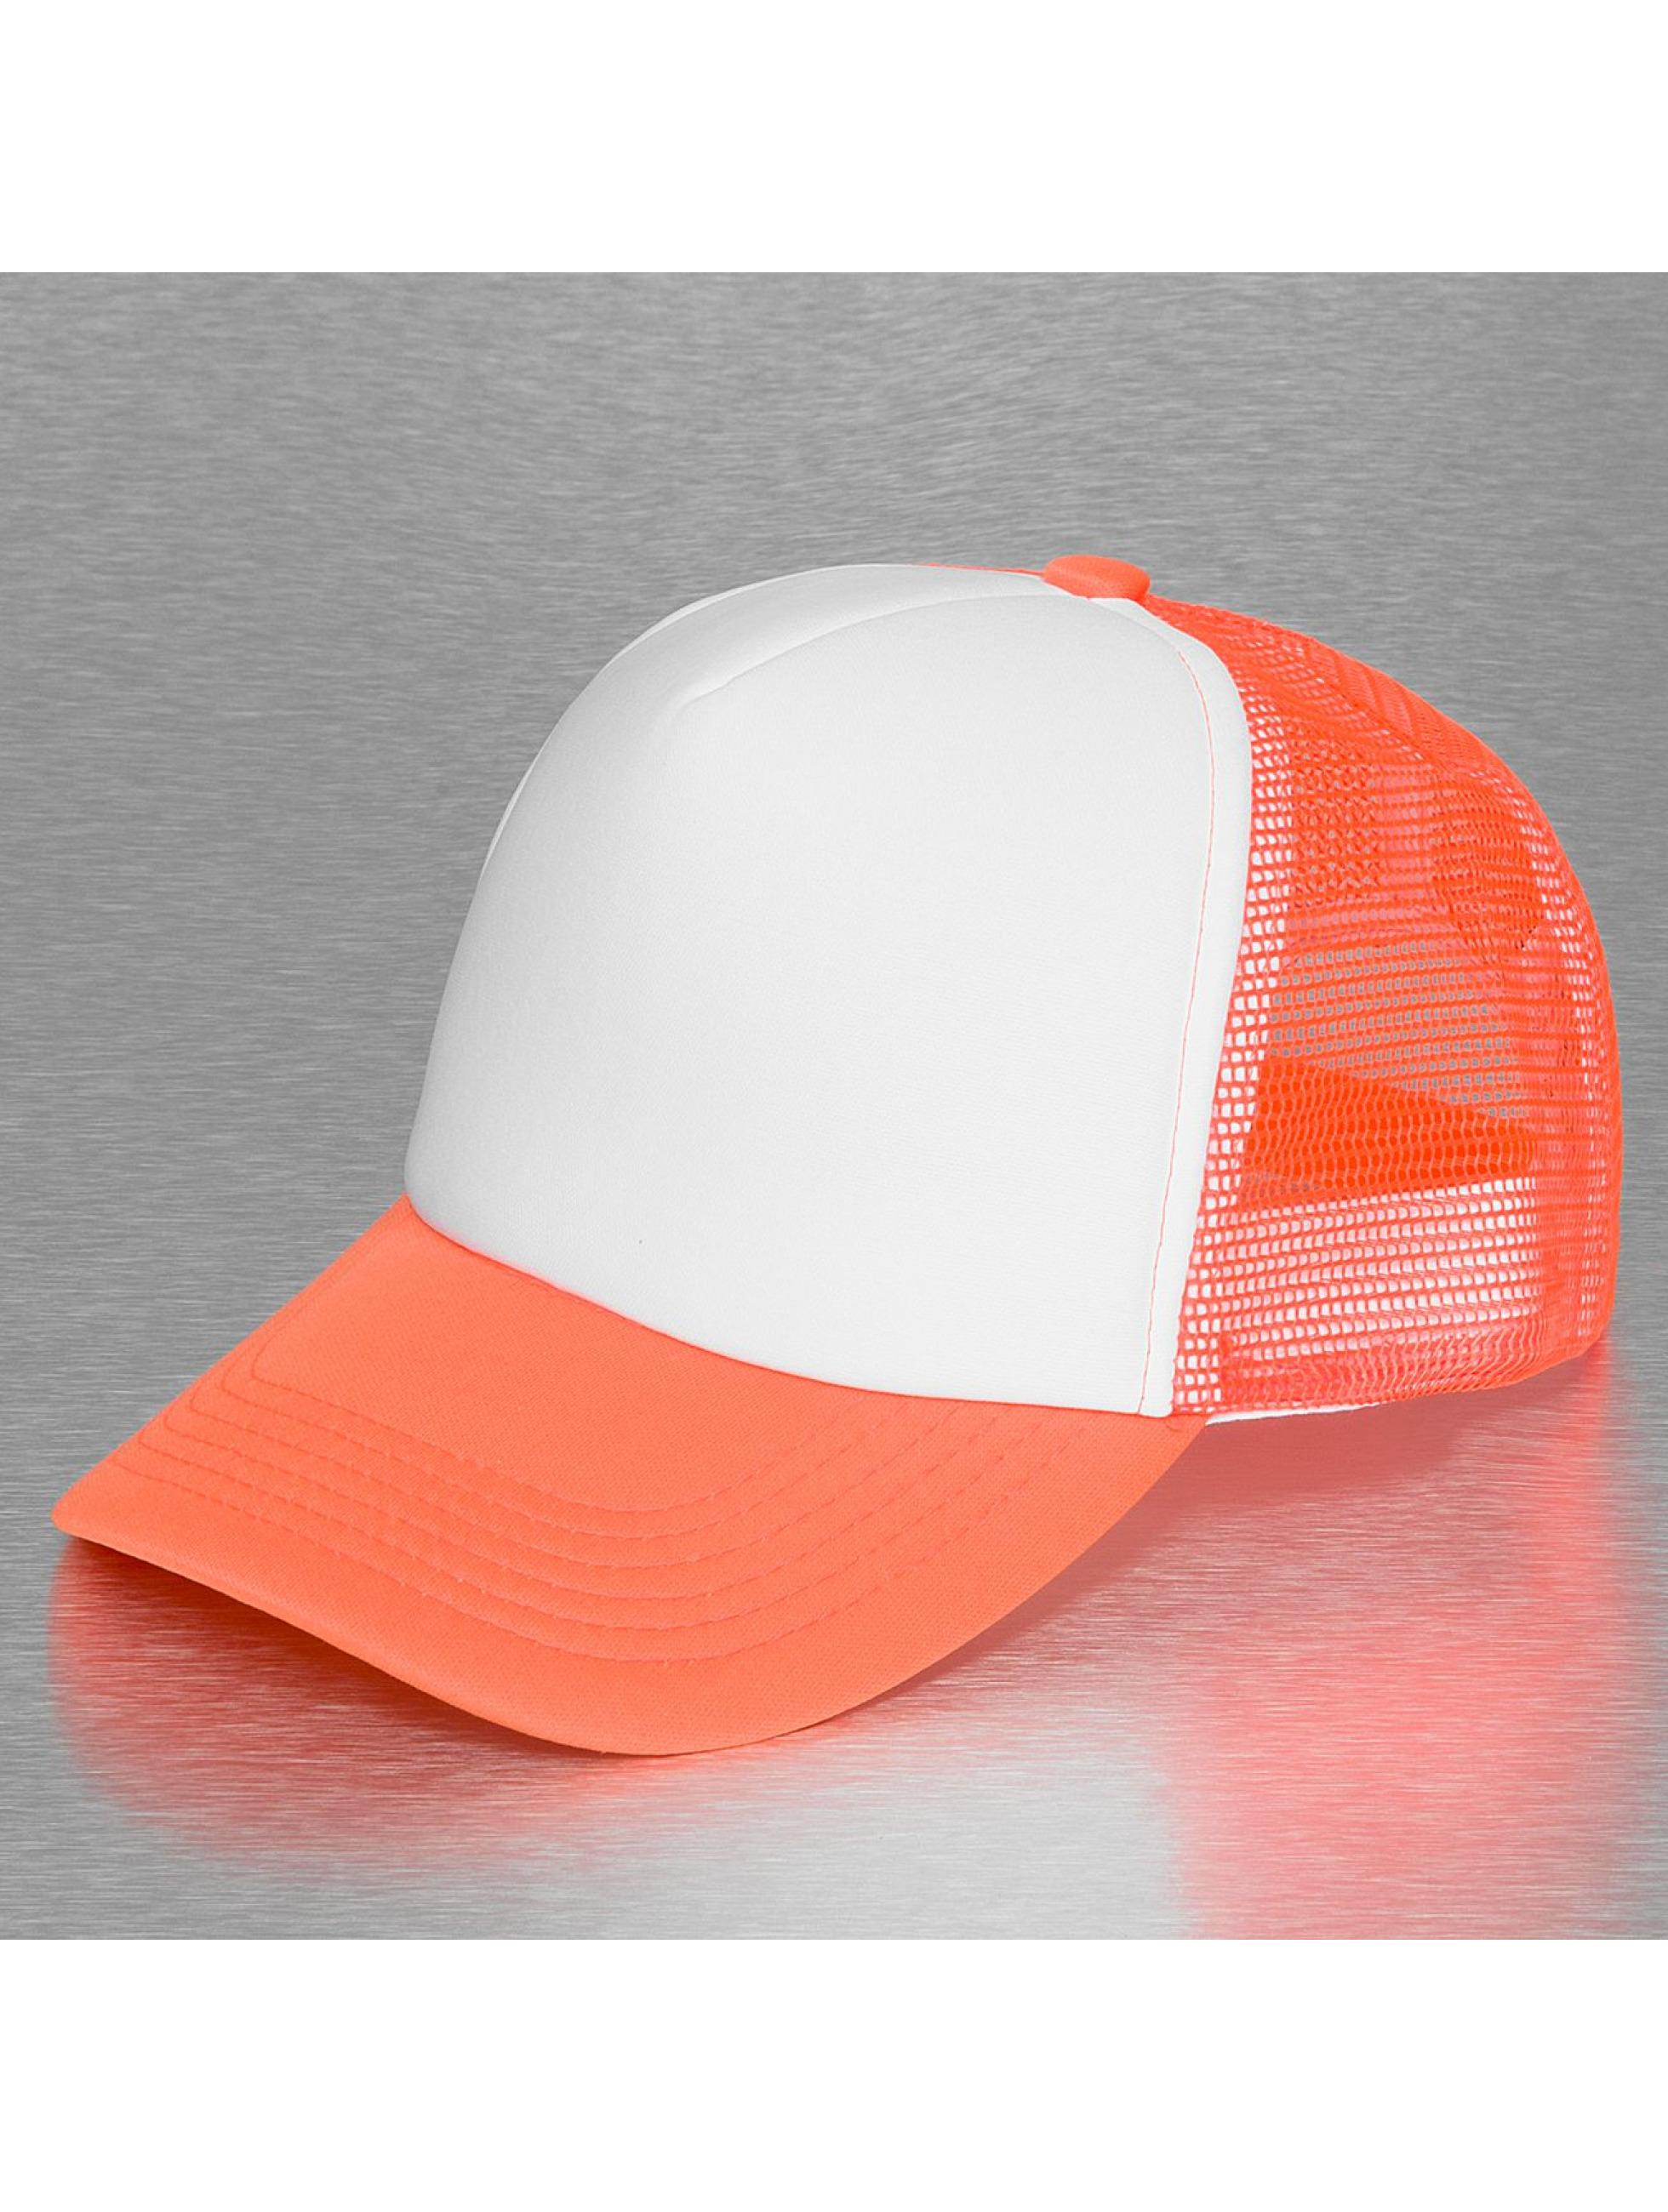 MSTRDS Neon Trucker Cap Orange